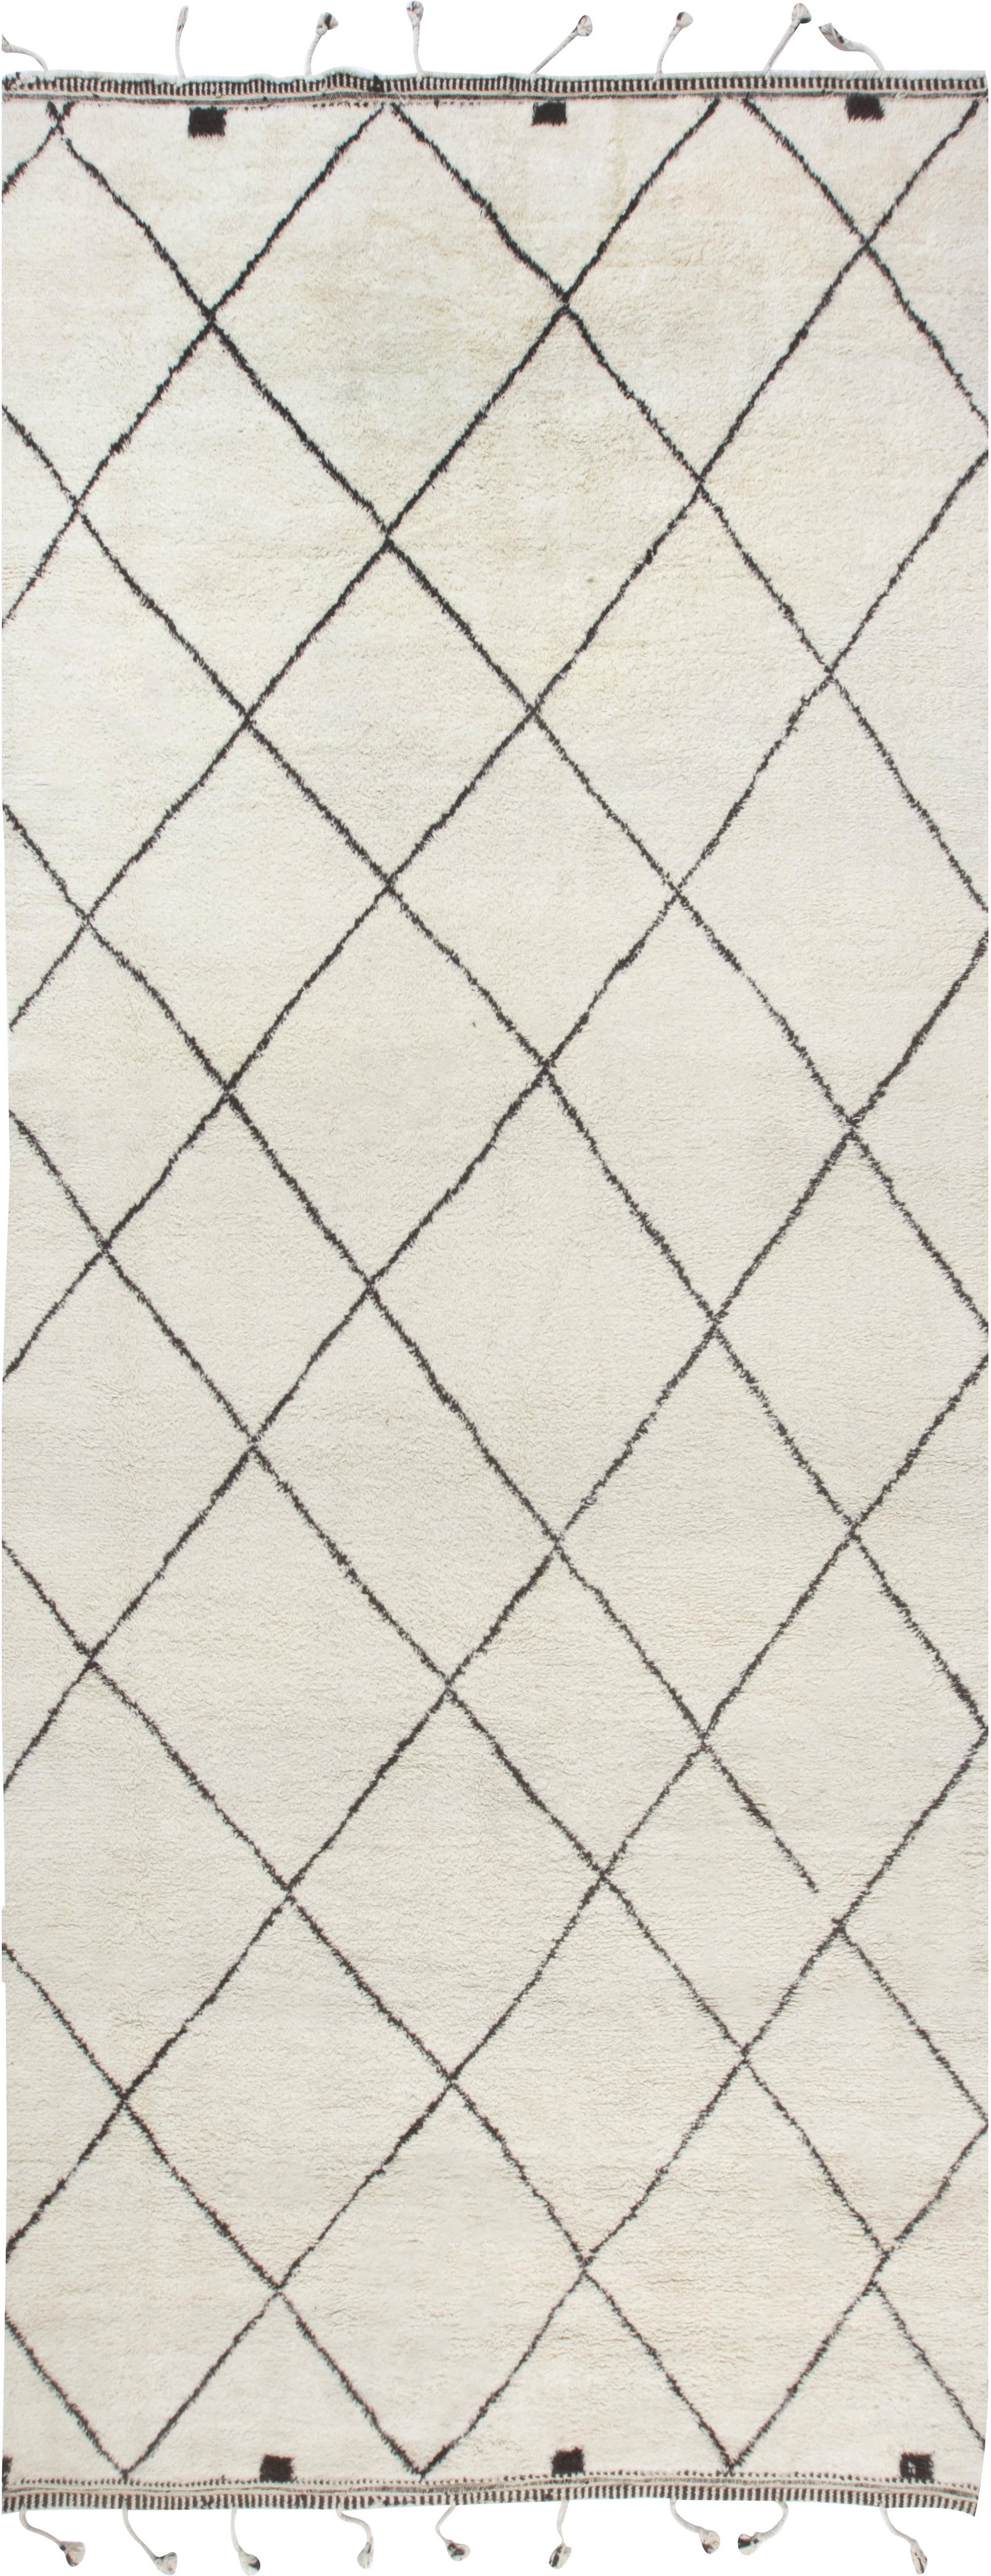 Modern Moroccan rug N11882